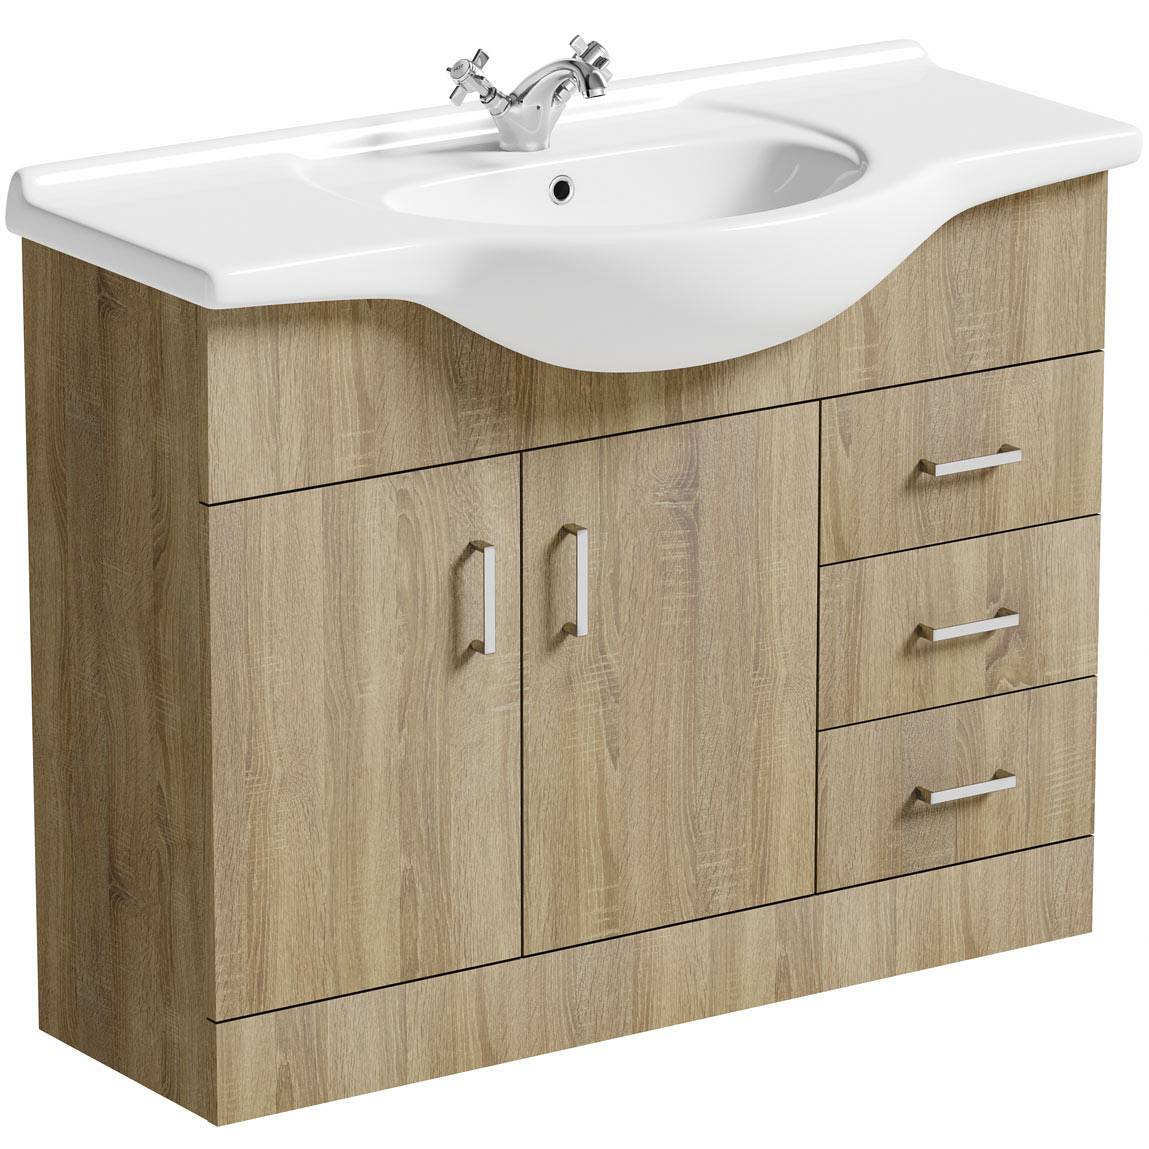 Image of Sienna Oak 105 Vanity Unit & Basin